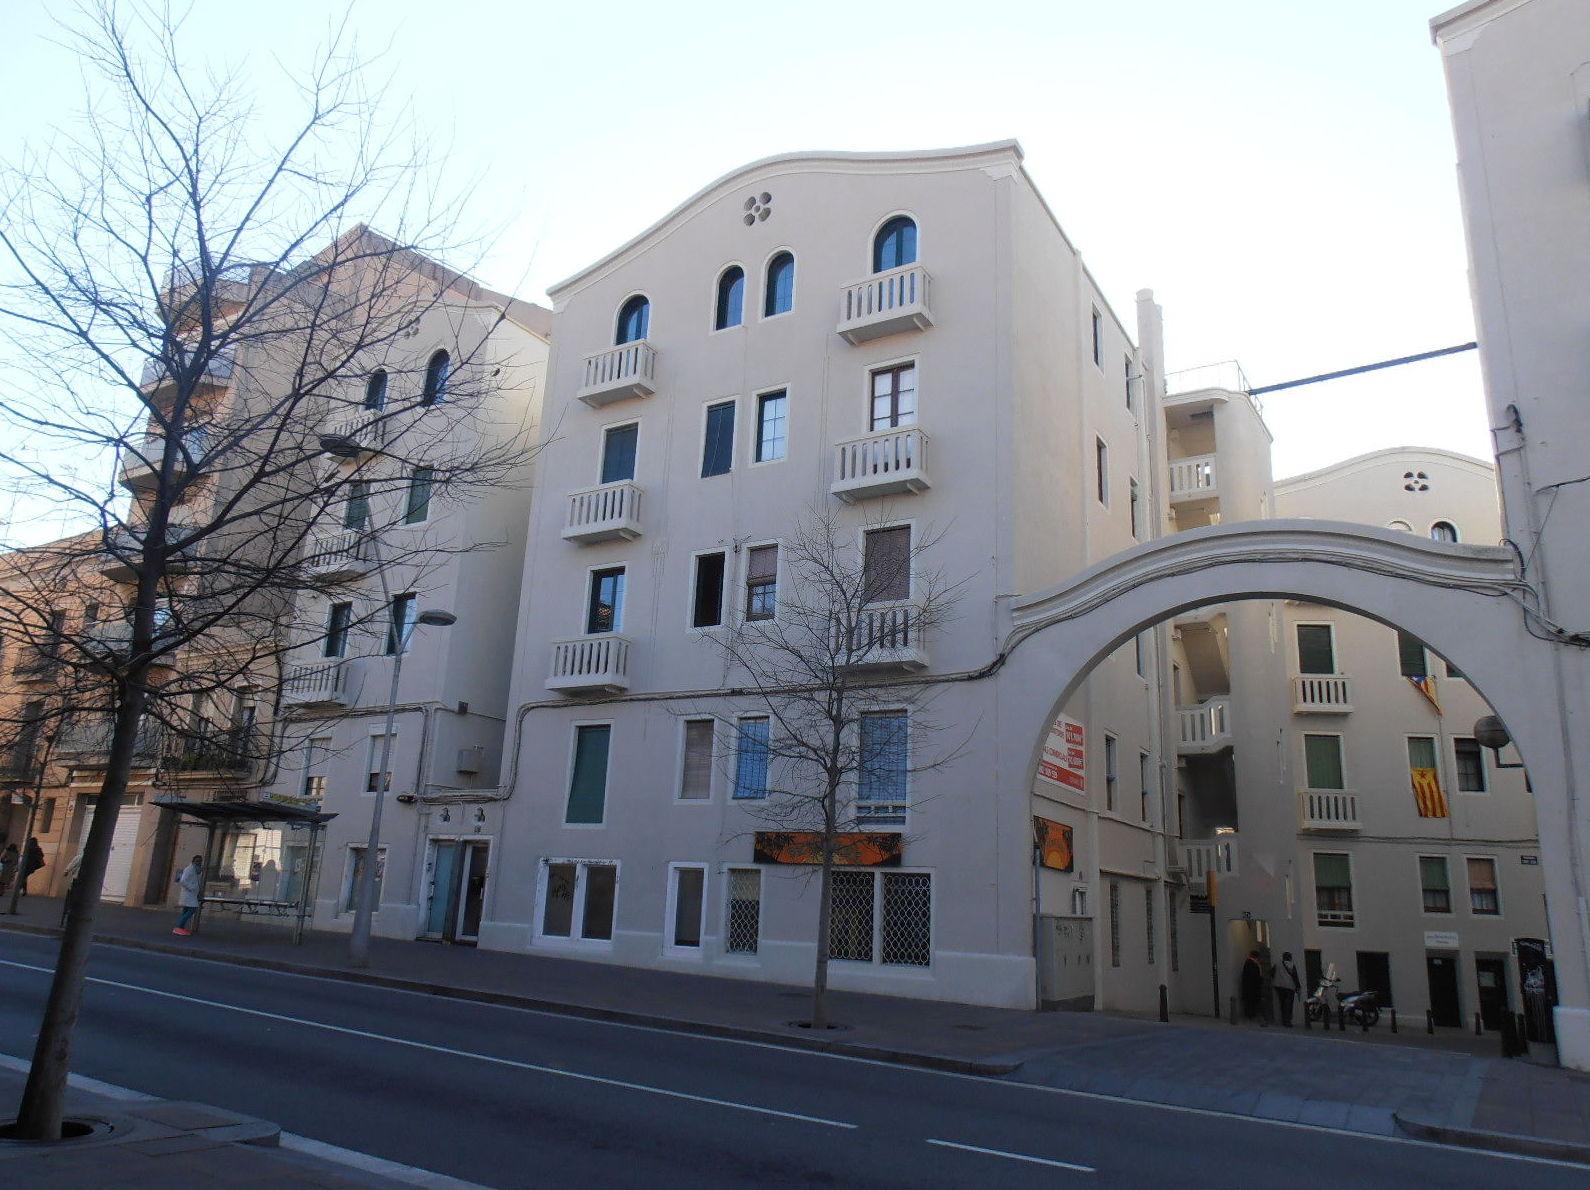 Foto 12 de conjunto arquitect nico de pisos en sant feliu de llobregat en sant feliu de - Venta pisos sant feliu de llobregat ...